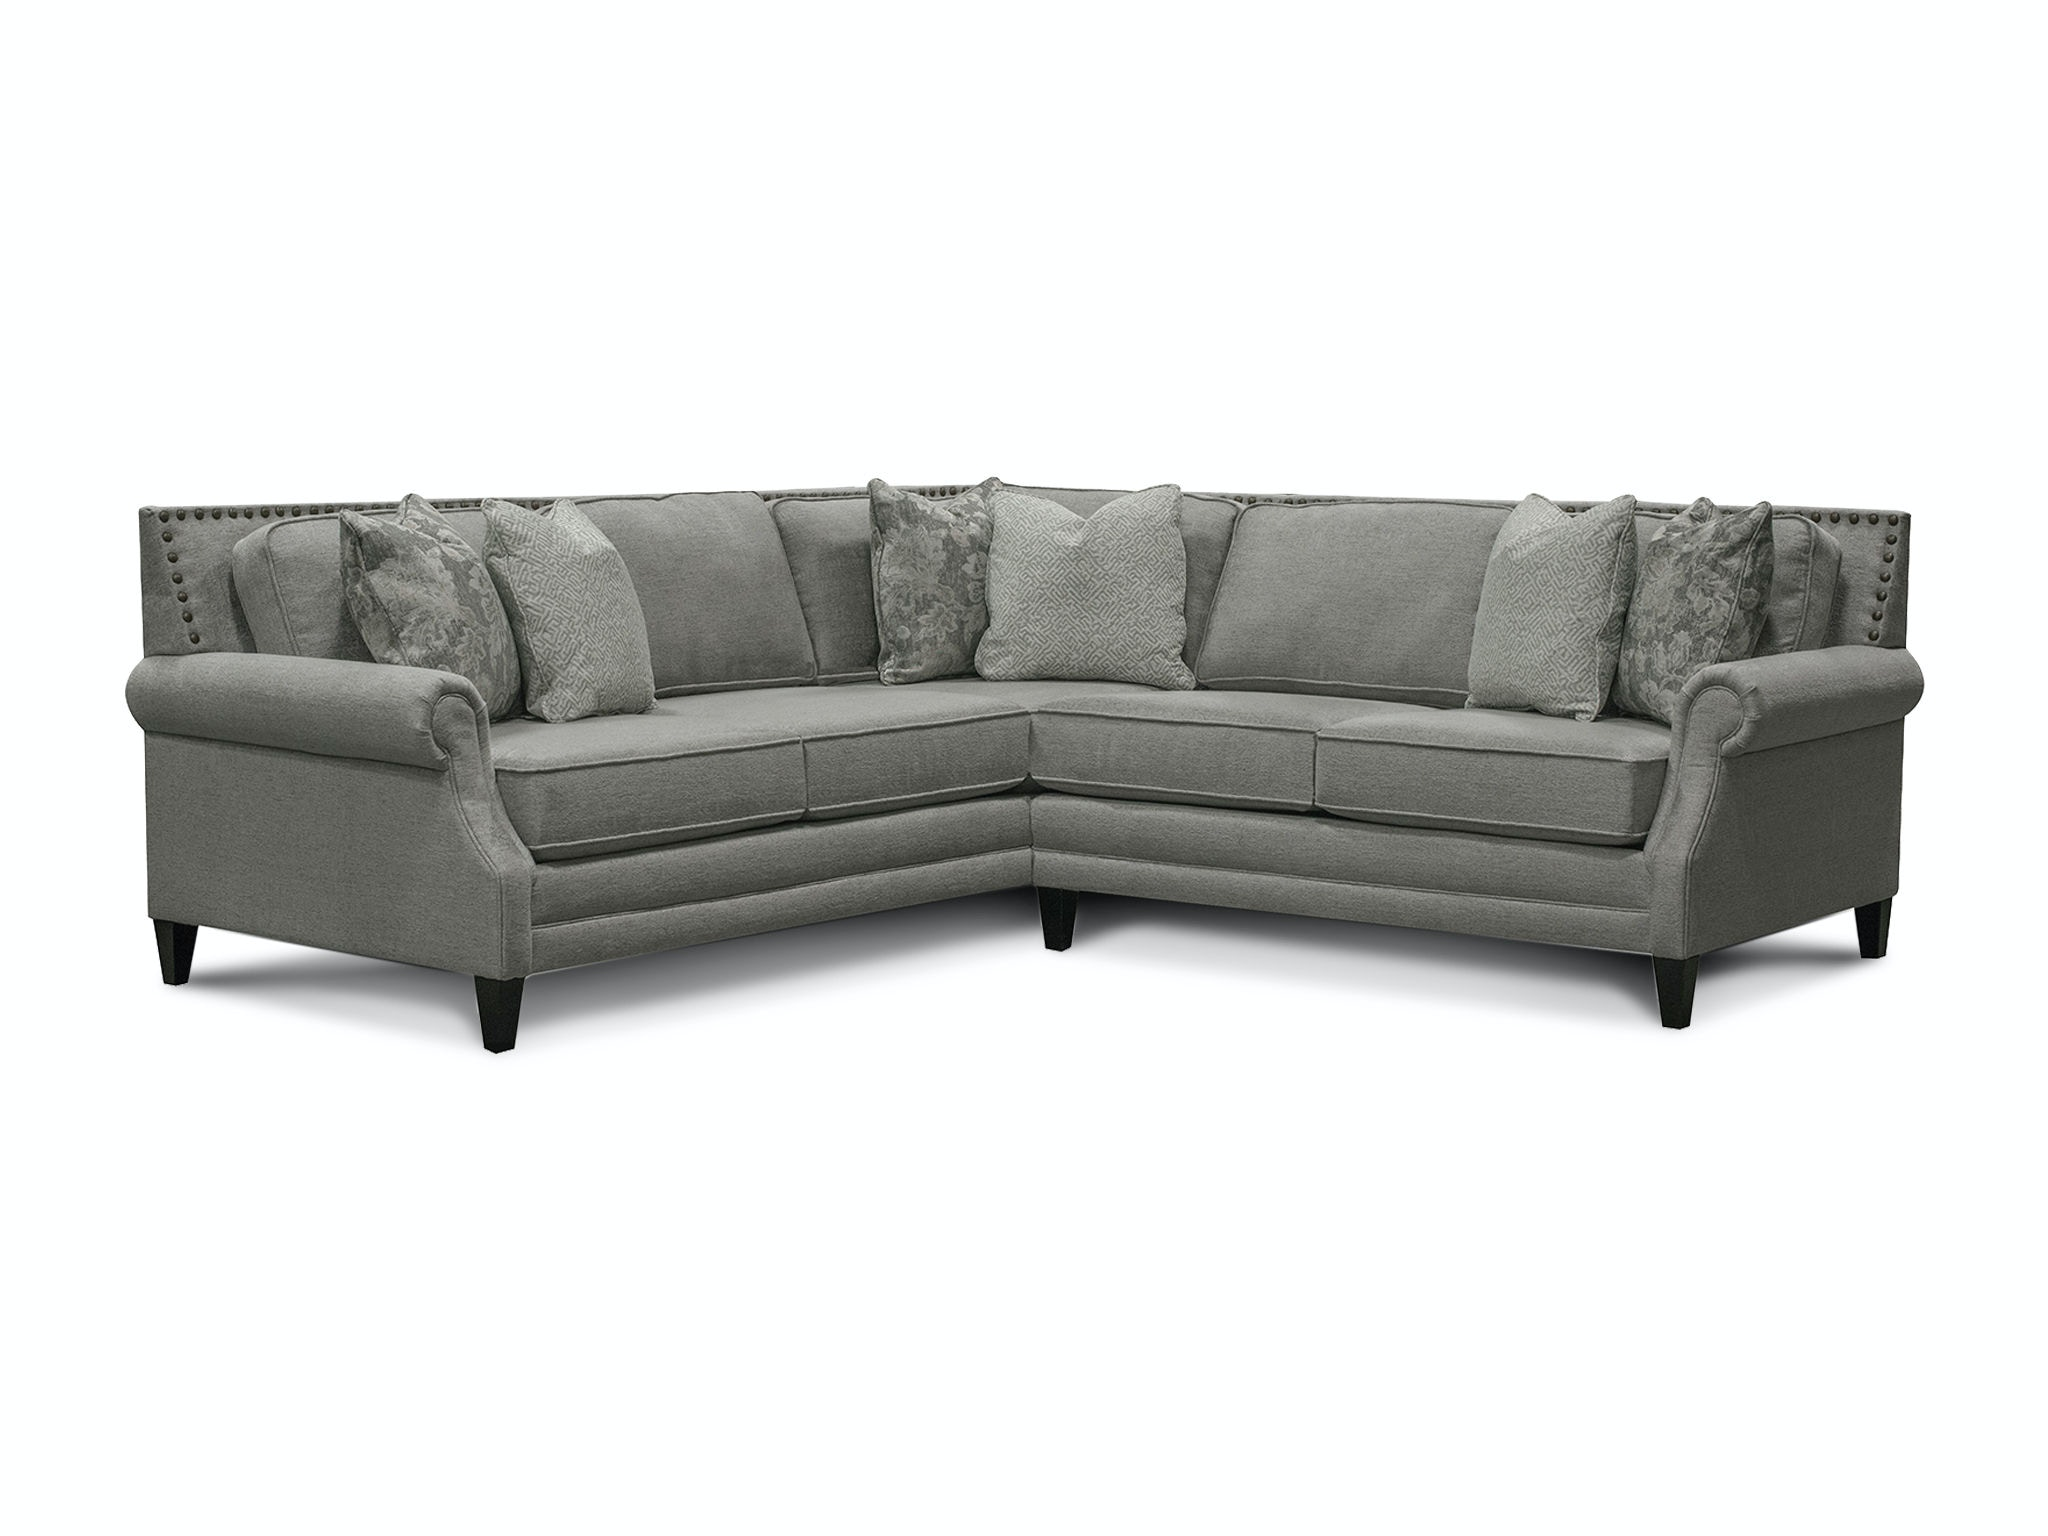 palmer sofa ashley furniture morandi mocha england living room sectional with nails 7l00n sect